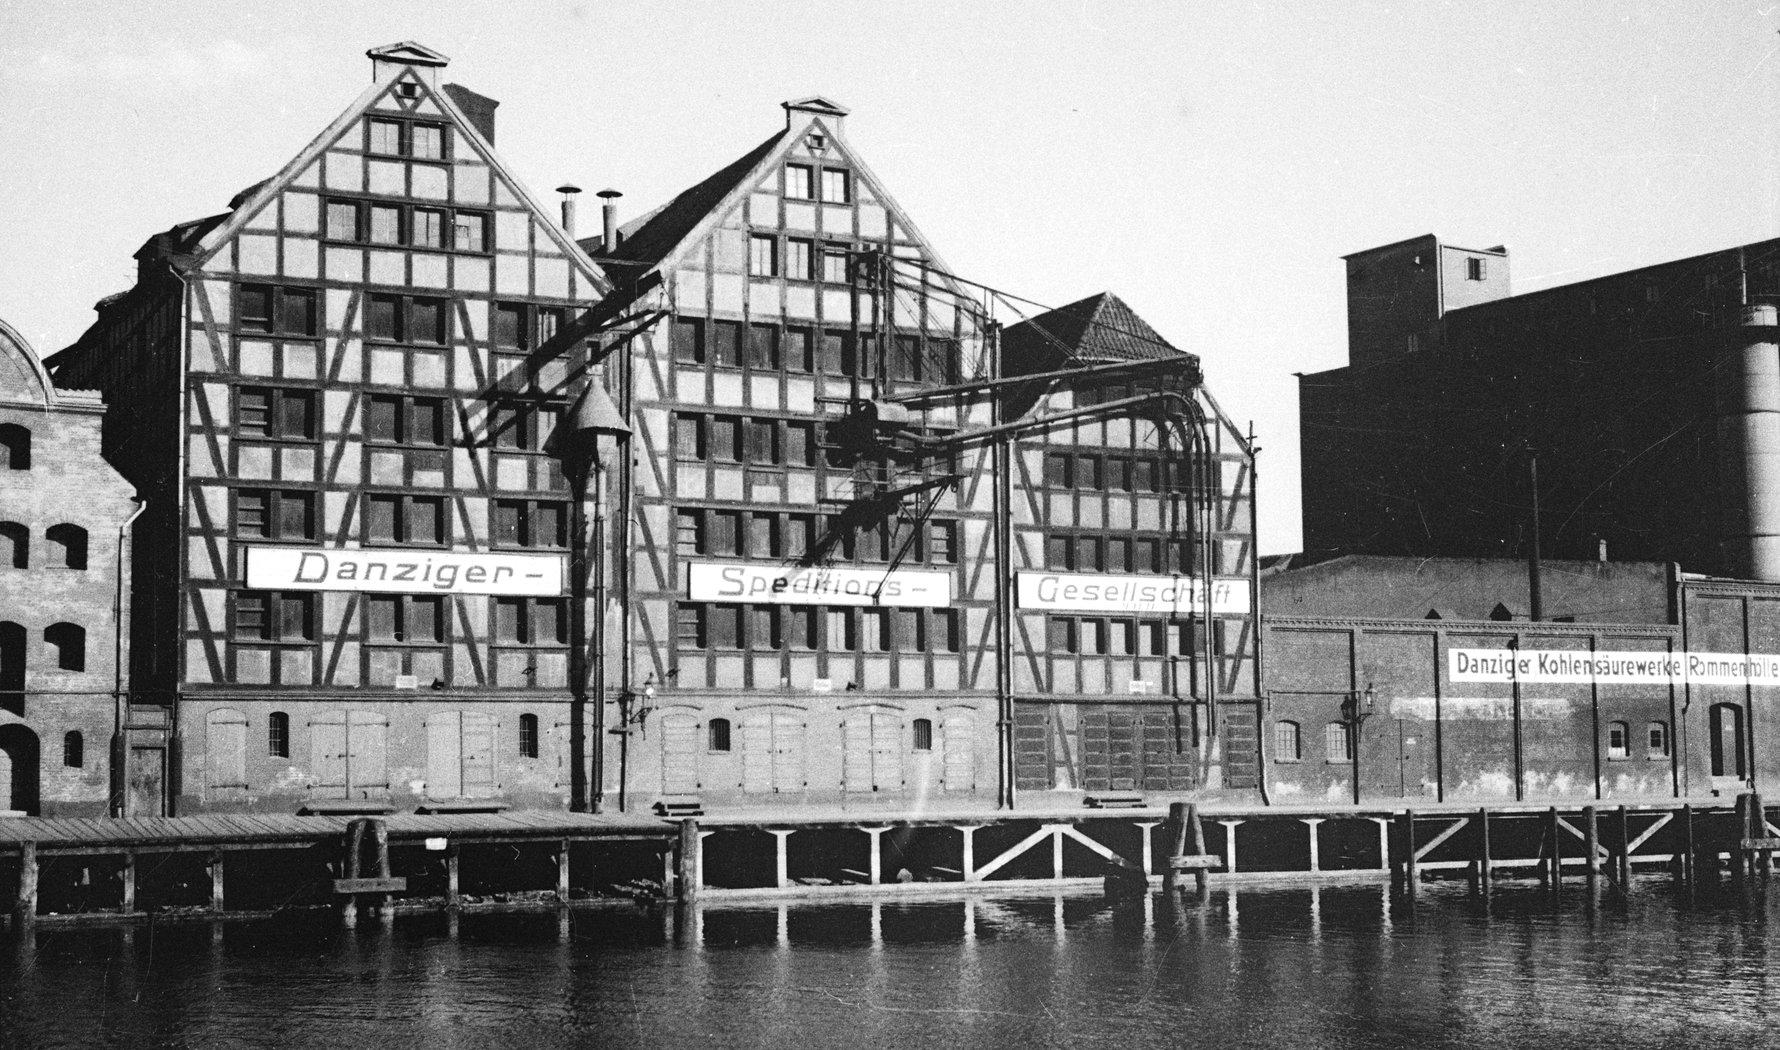 Granary Island Waterfront - Anne-Marie Schwarzenbach, 1937